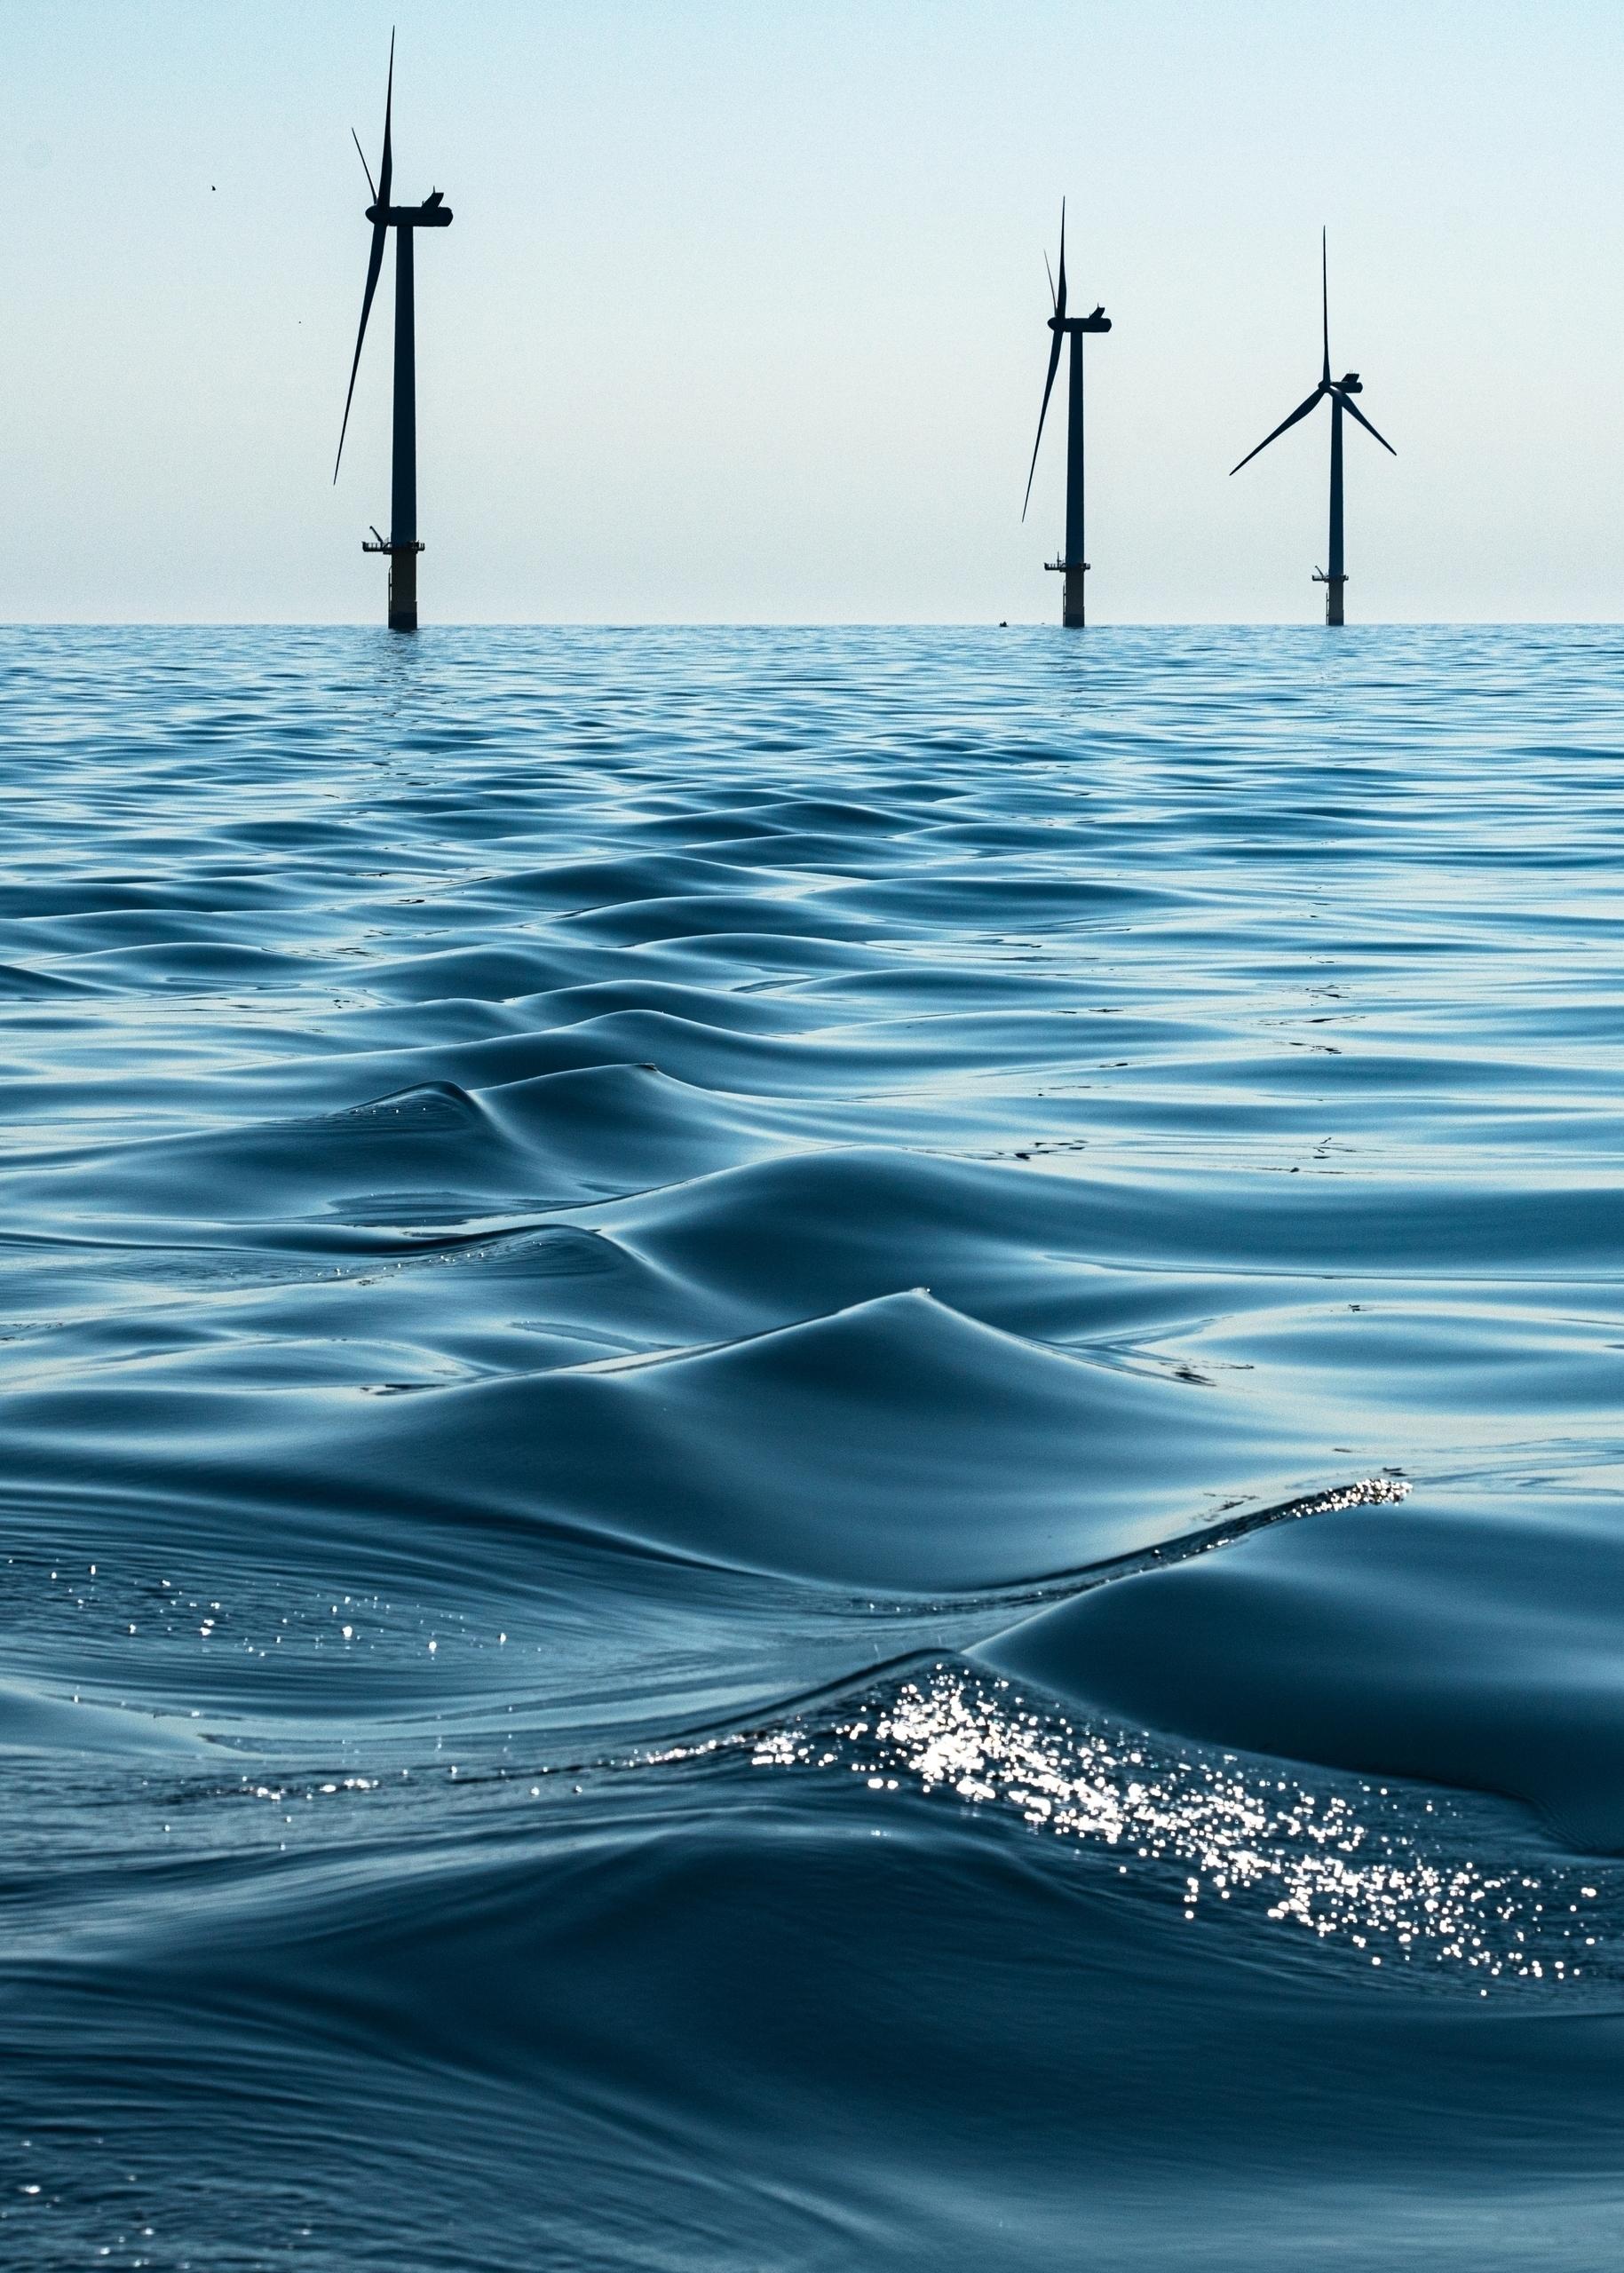 Rampion Wind Farm, Brighton 268 - notabene | ello